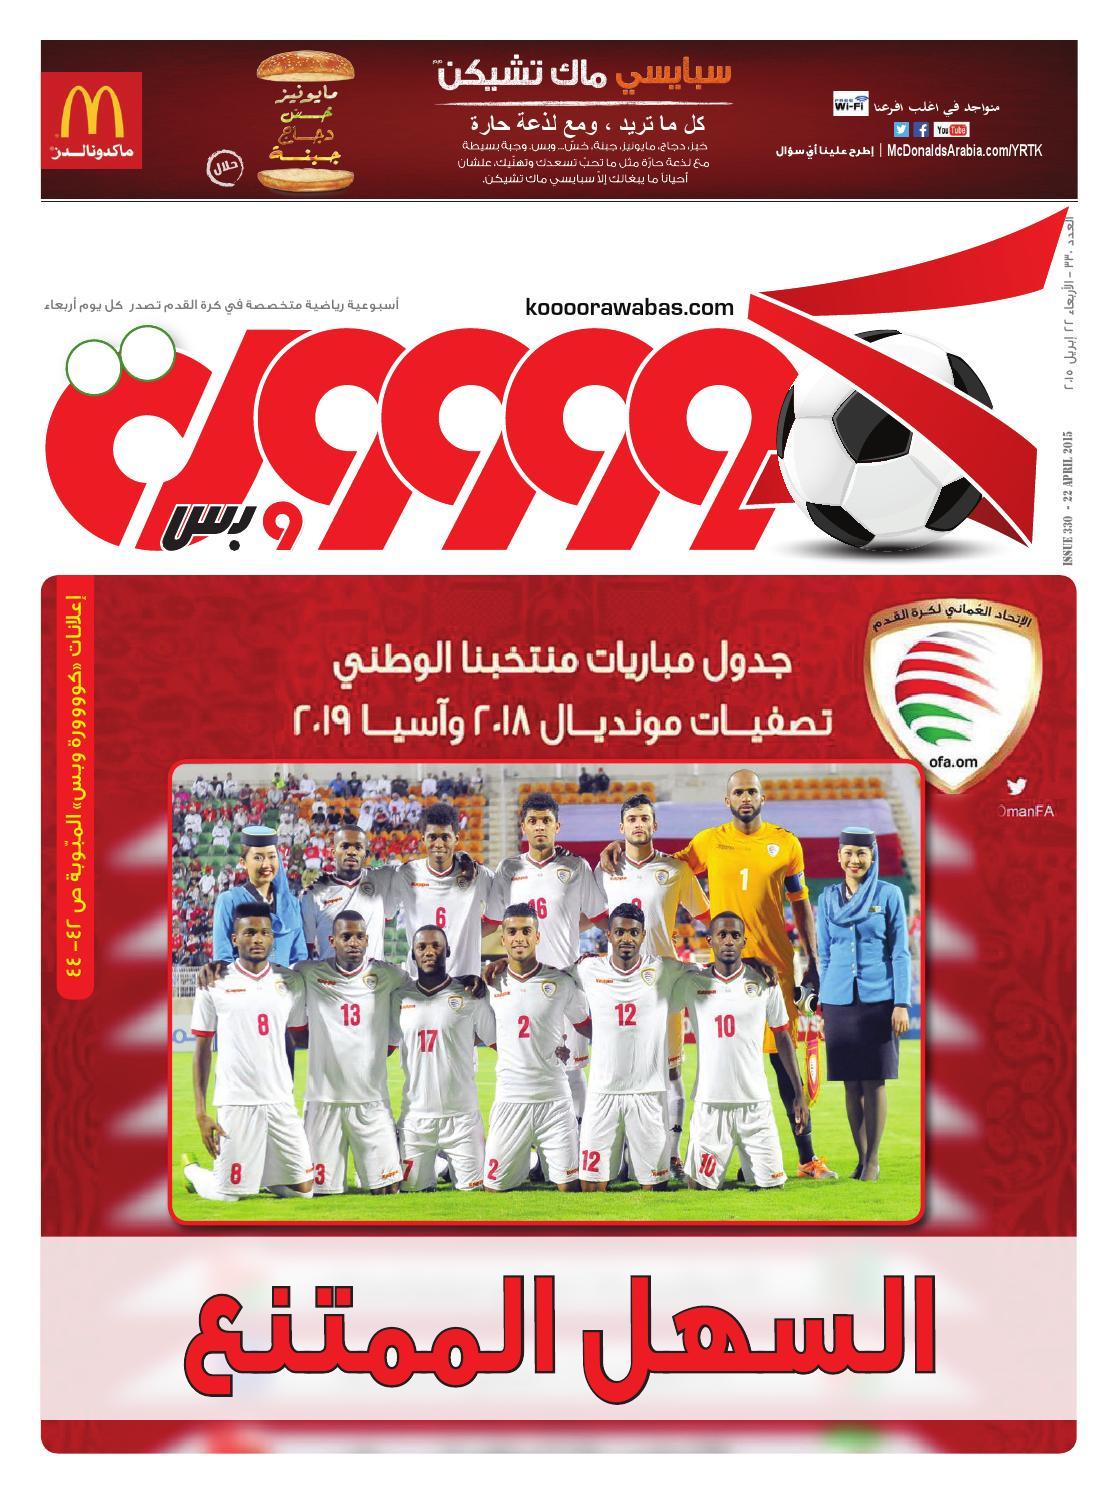 Koooora Wa Bas Issue 330 22 April 2015 By Koooora Wa Bas Issuu